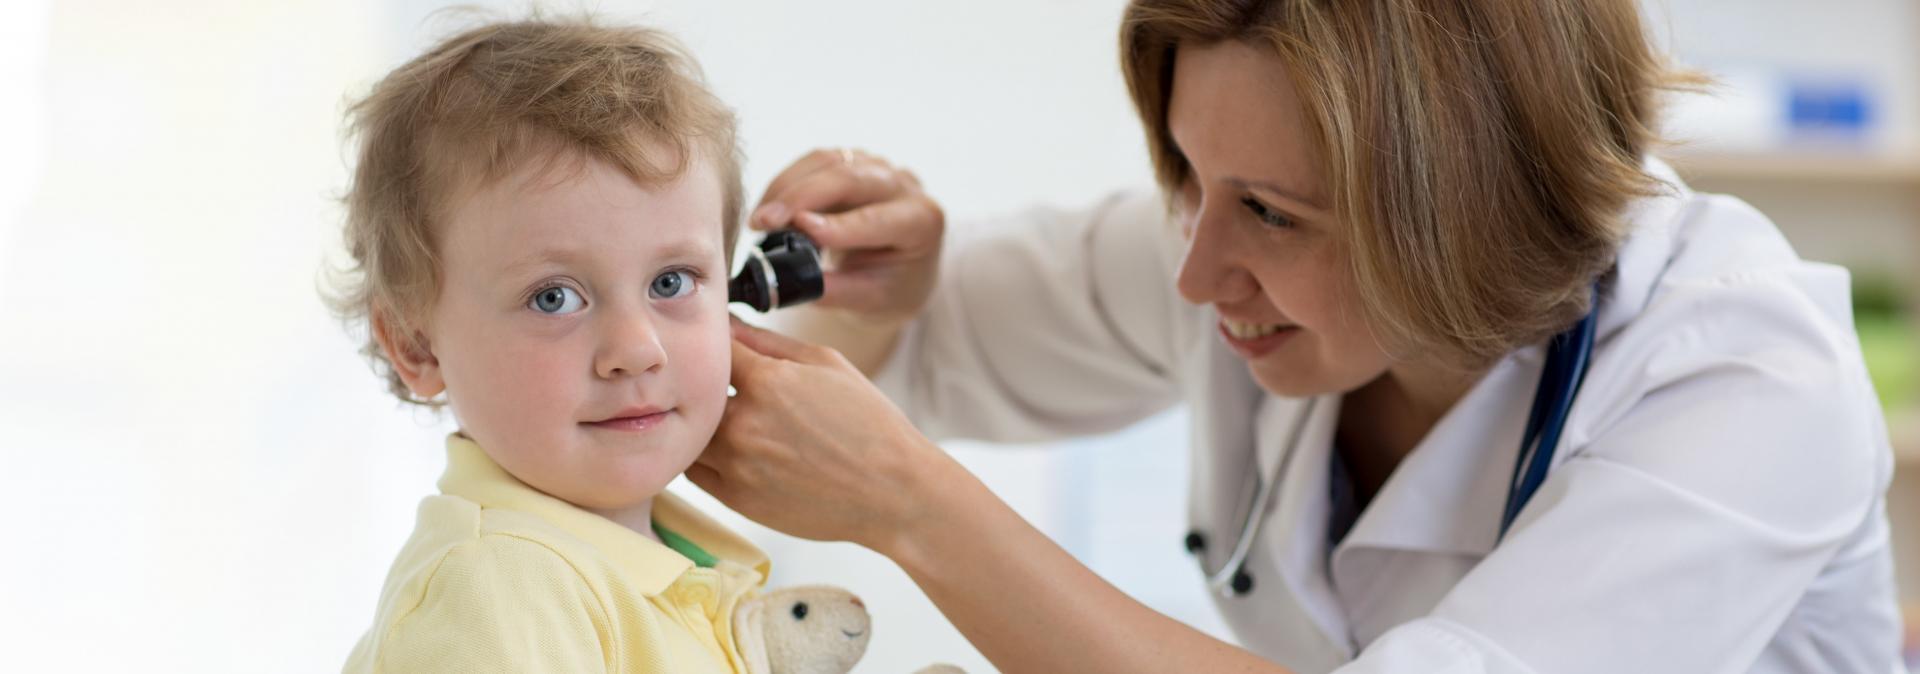 Uyttenhoef Roland - pédiatre - wazaa